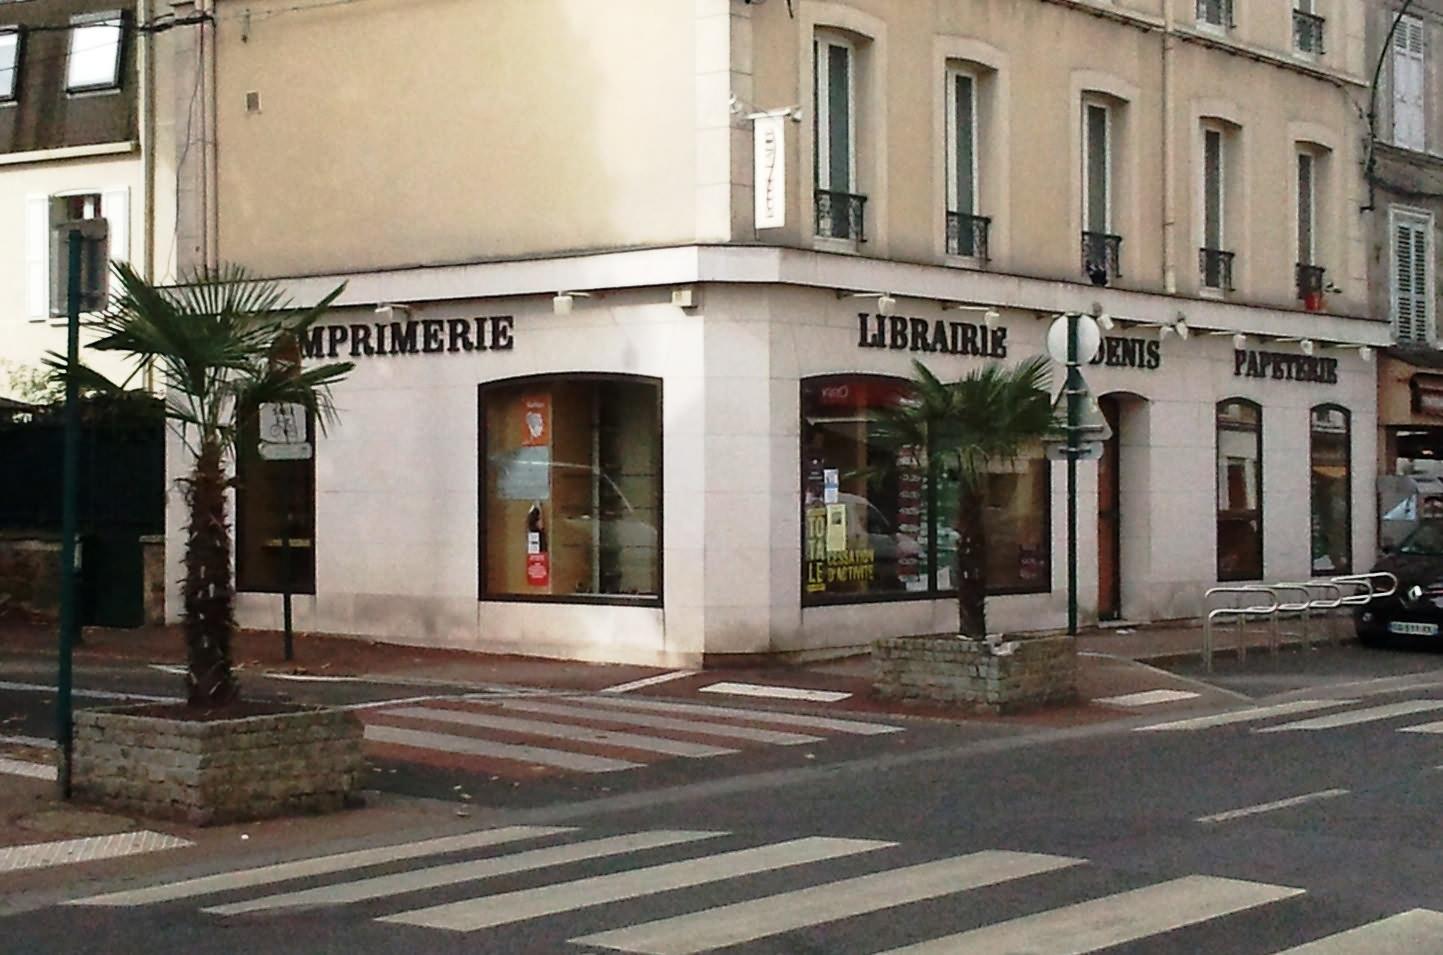 librairie Denis 3-4.jpg